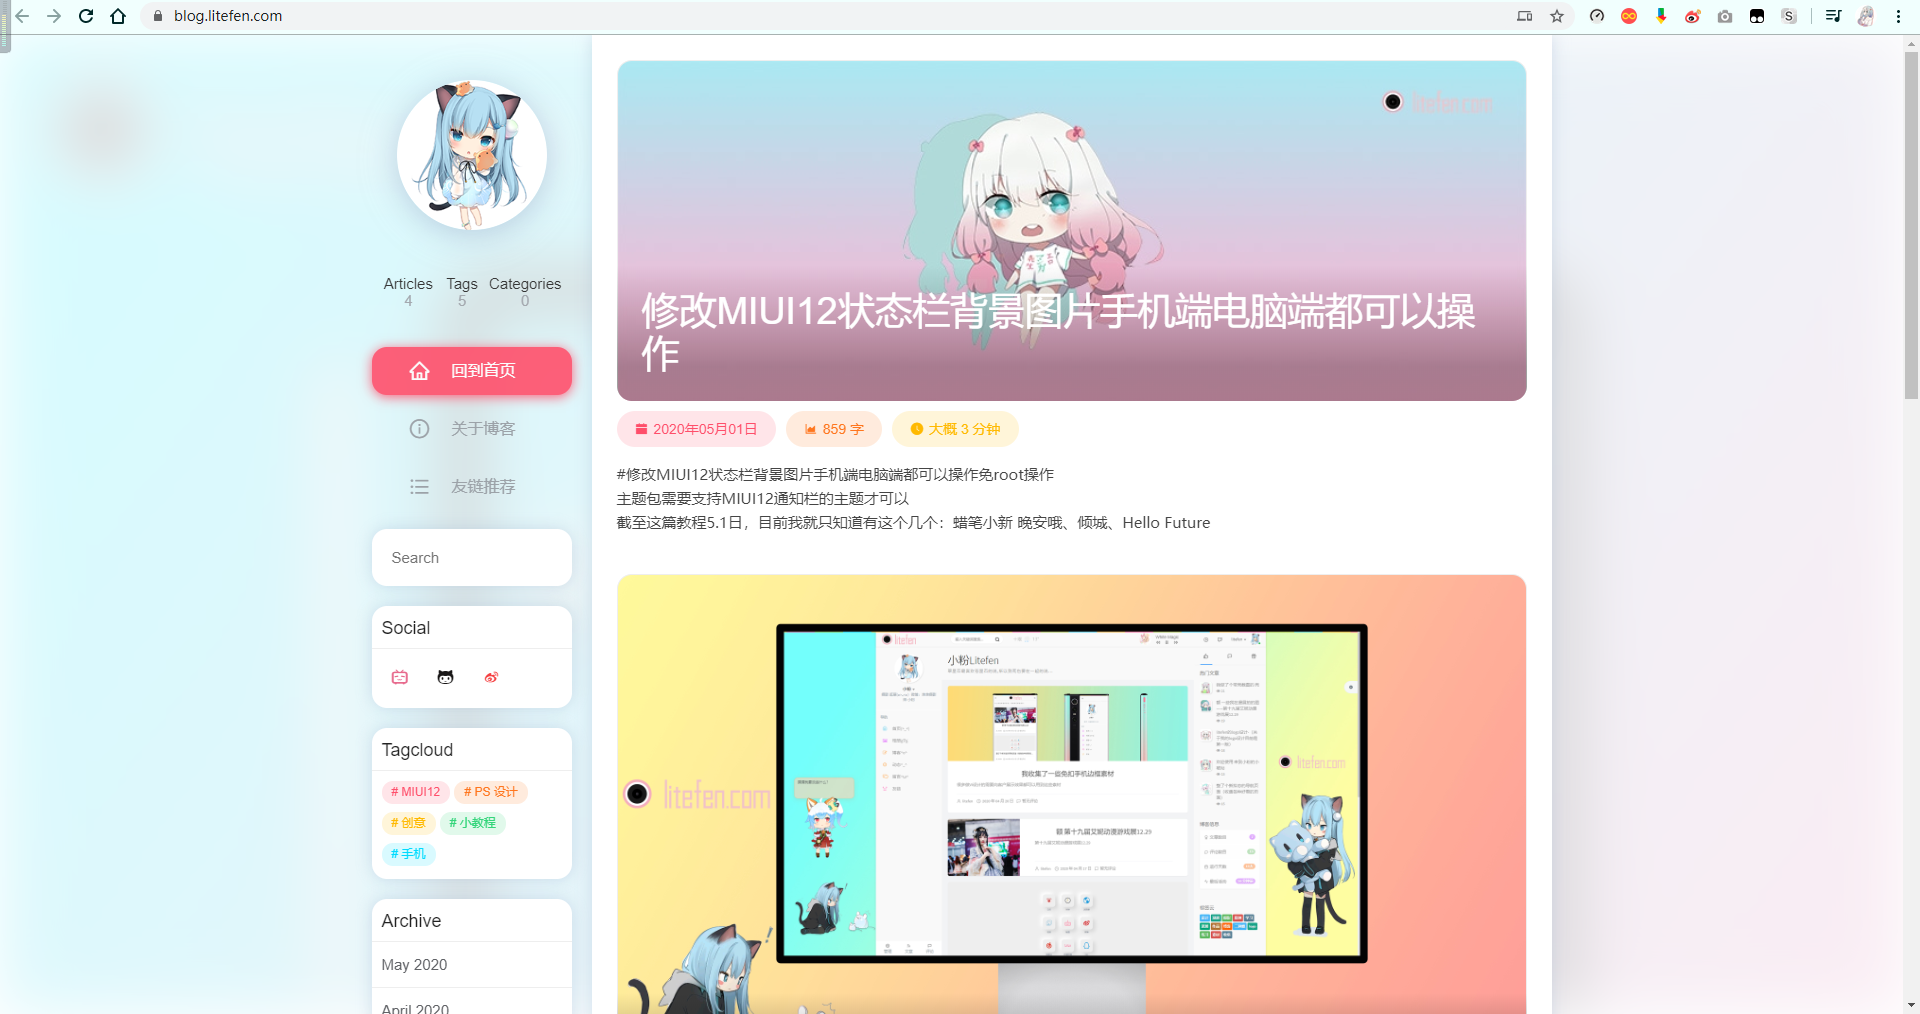 litefen's blog hexo+github静态博客